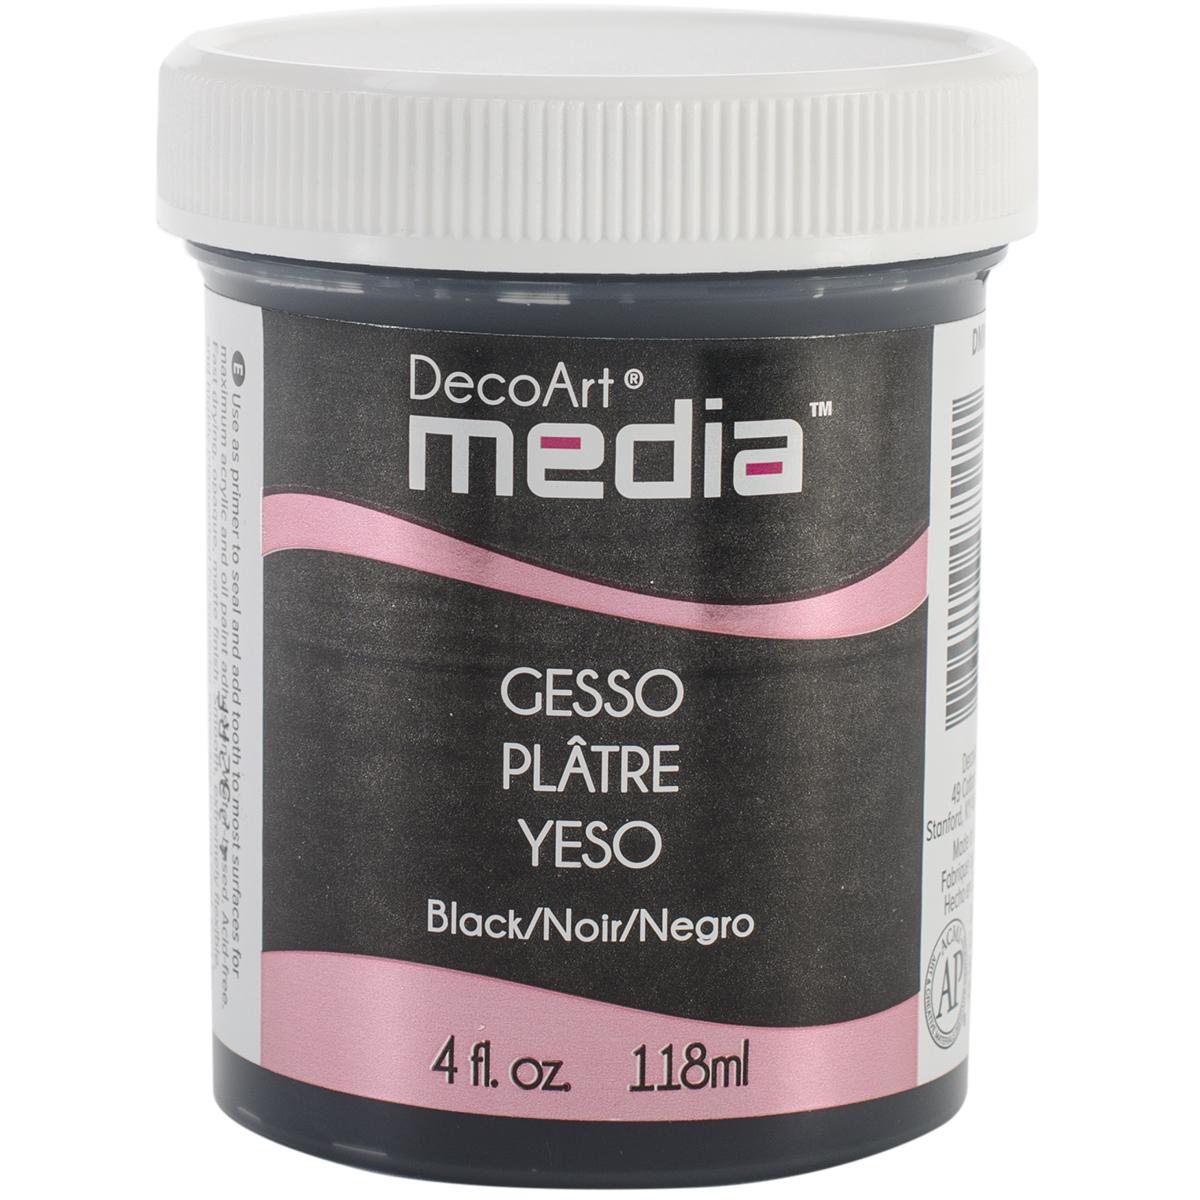 DecoArt Media Gesso 4oz-Black